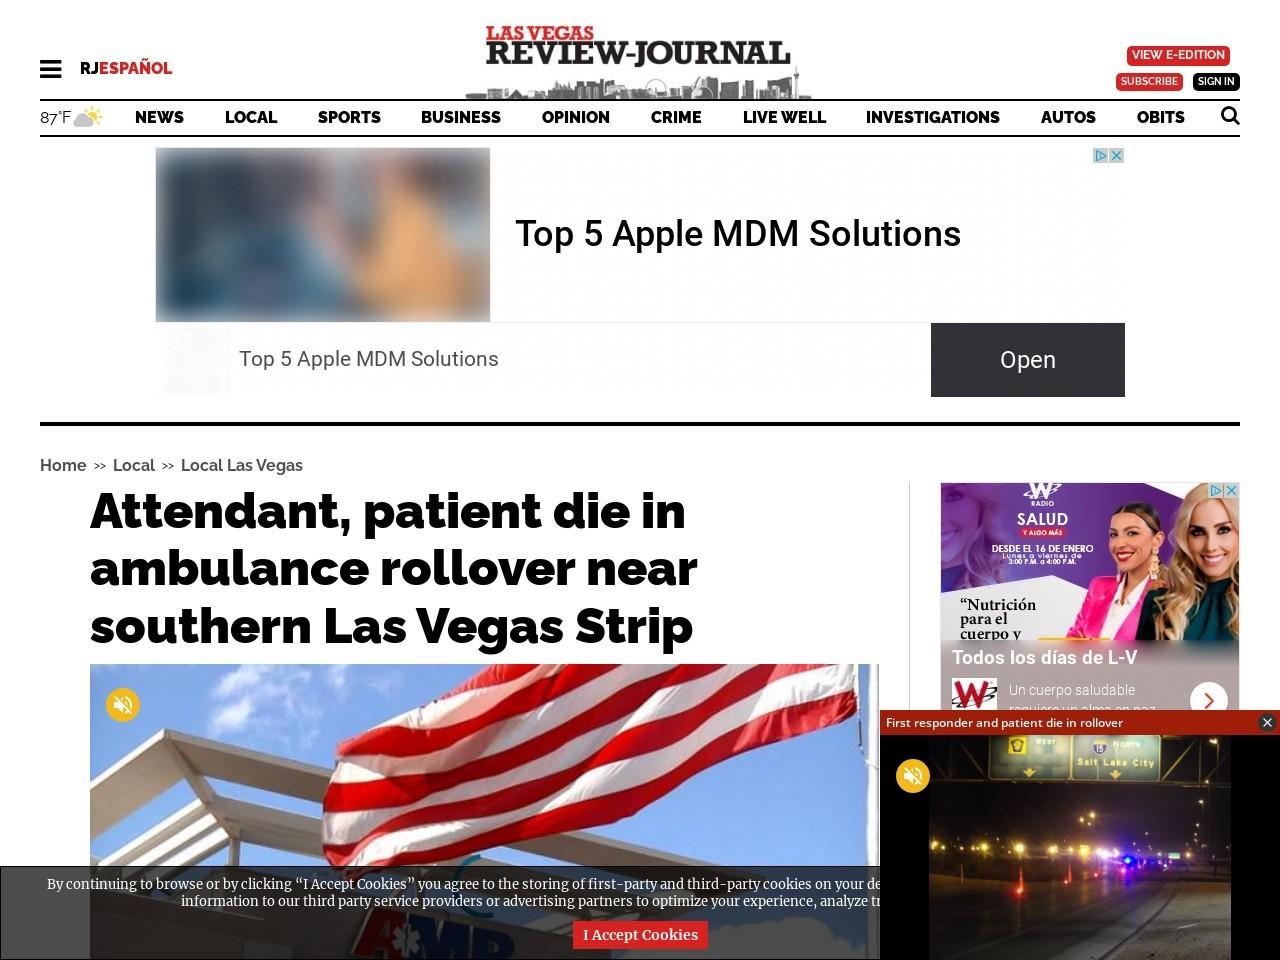 EMT, patient die in ambulance rollover near southern Las Vegas Strip